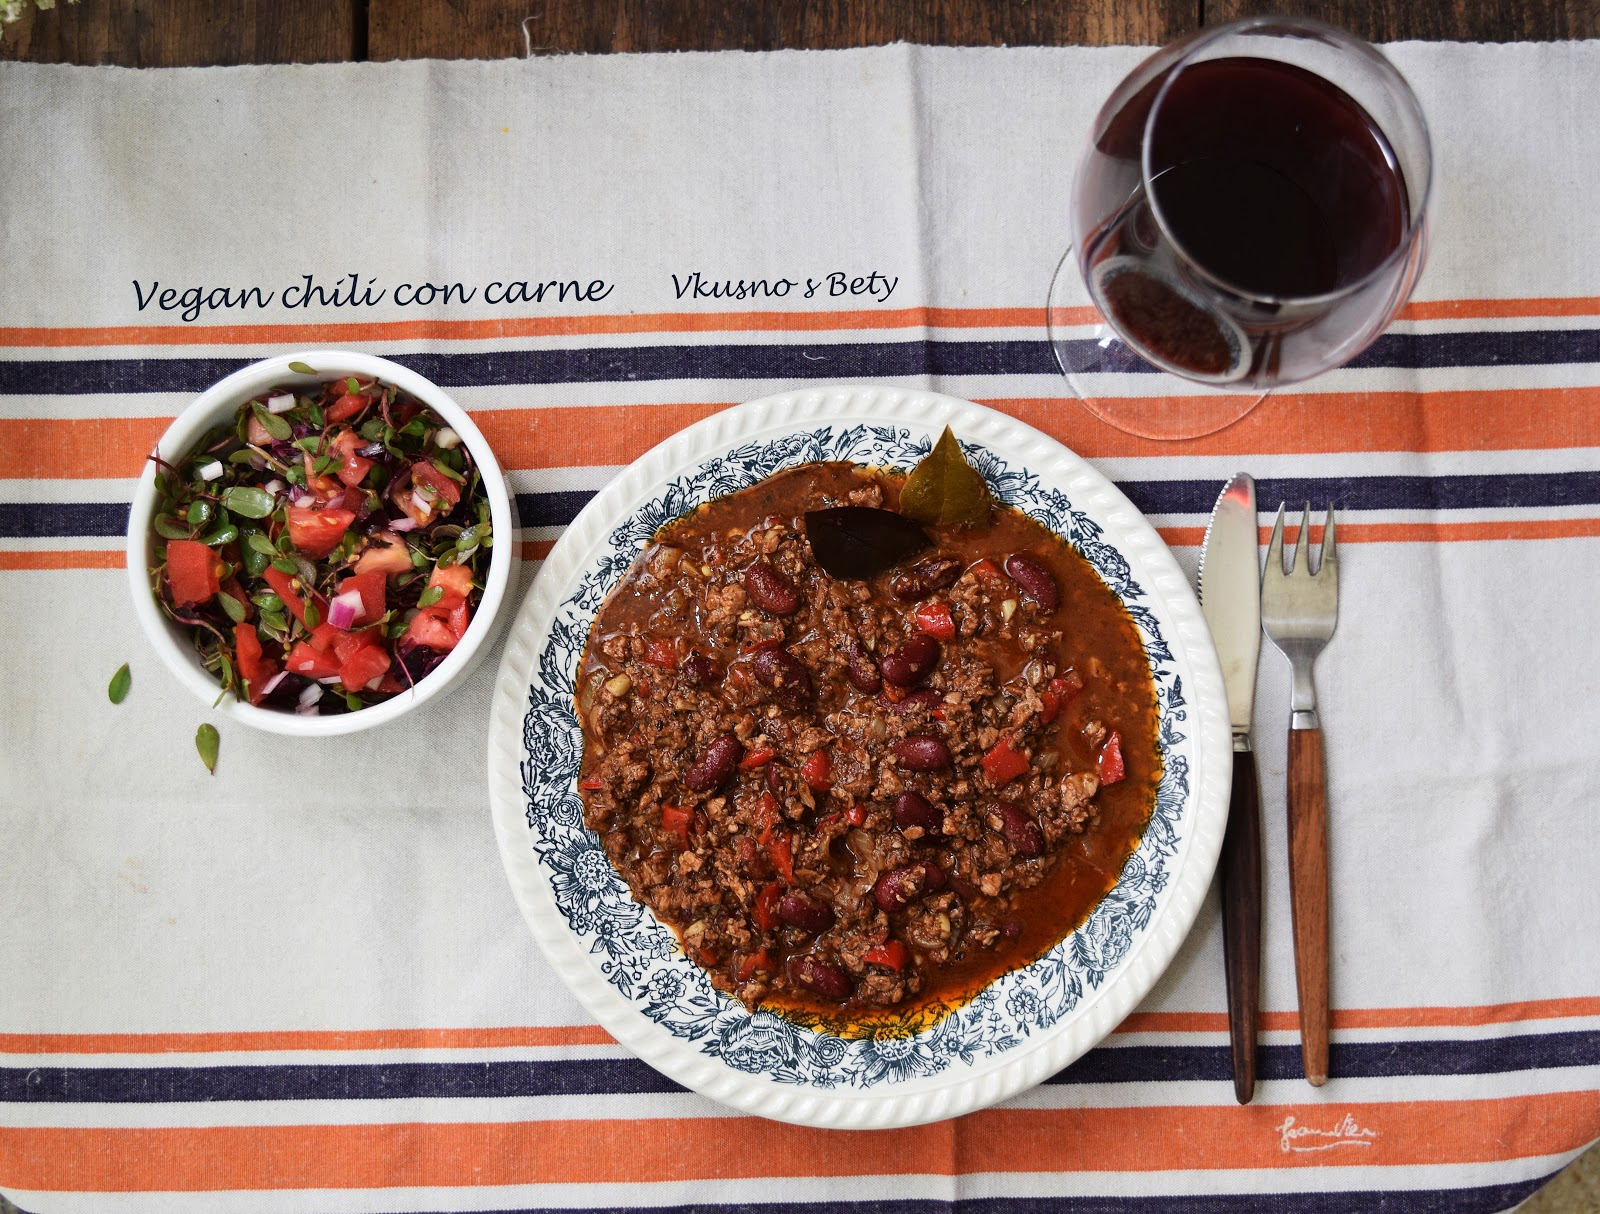 vegan chili con carne. Black Bedroom Furniture Sets. Home Design Ideas